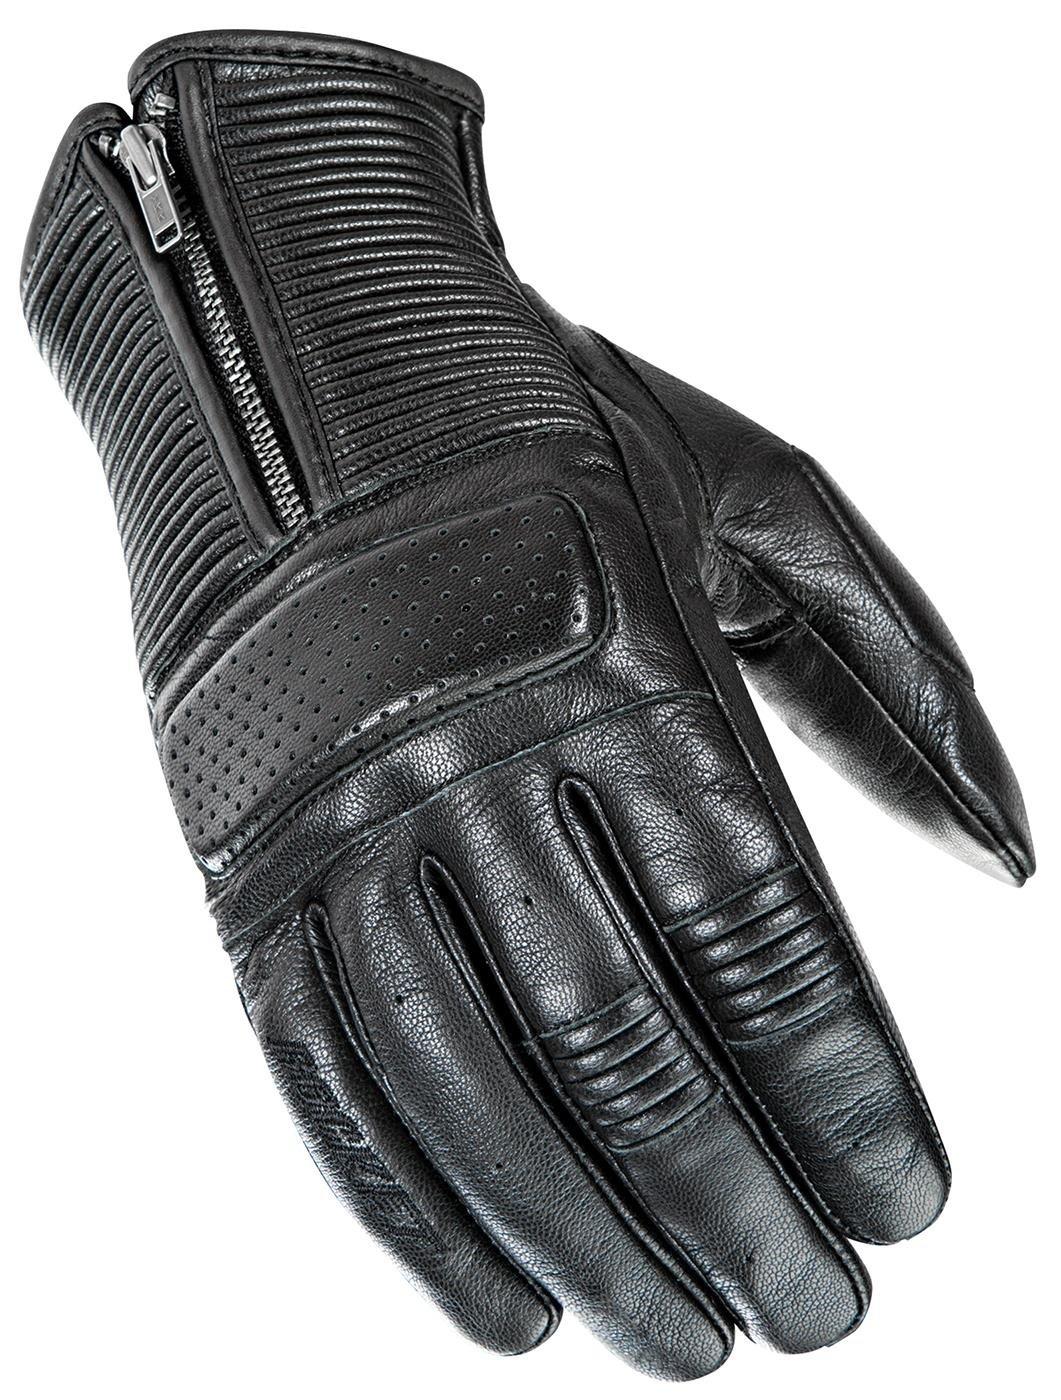 Motorcycle gloves cruiser - Amazon Com Joe Rocket Men S Caf Racer Motorcycle Gloves Black Medium Automotive